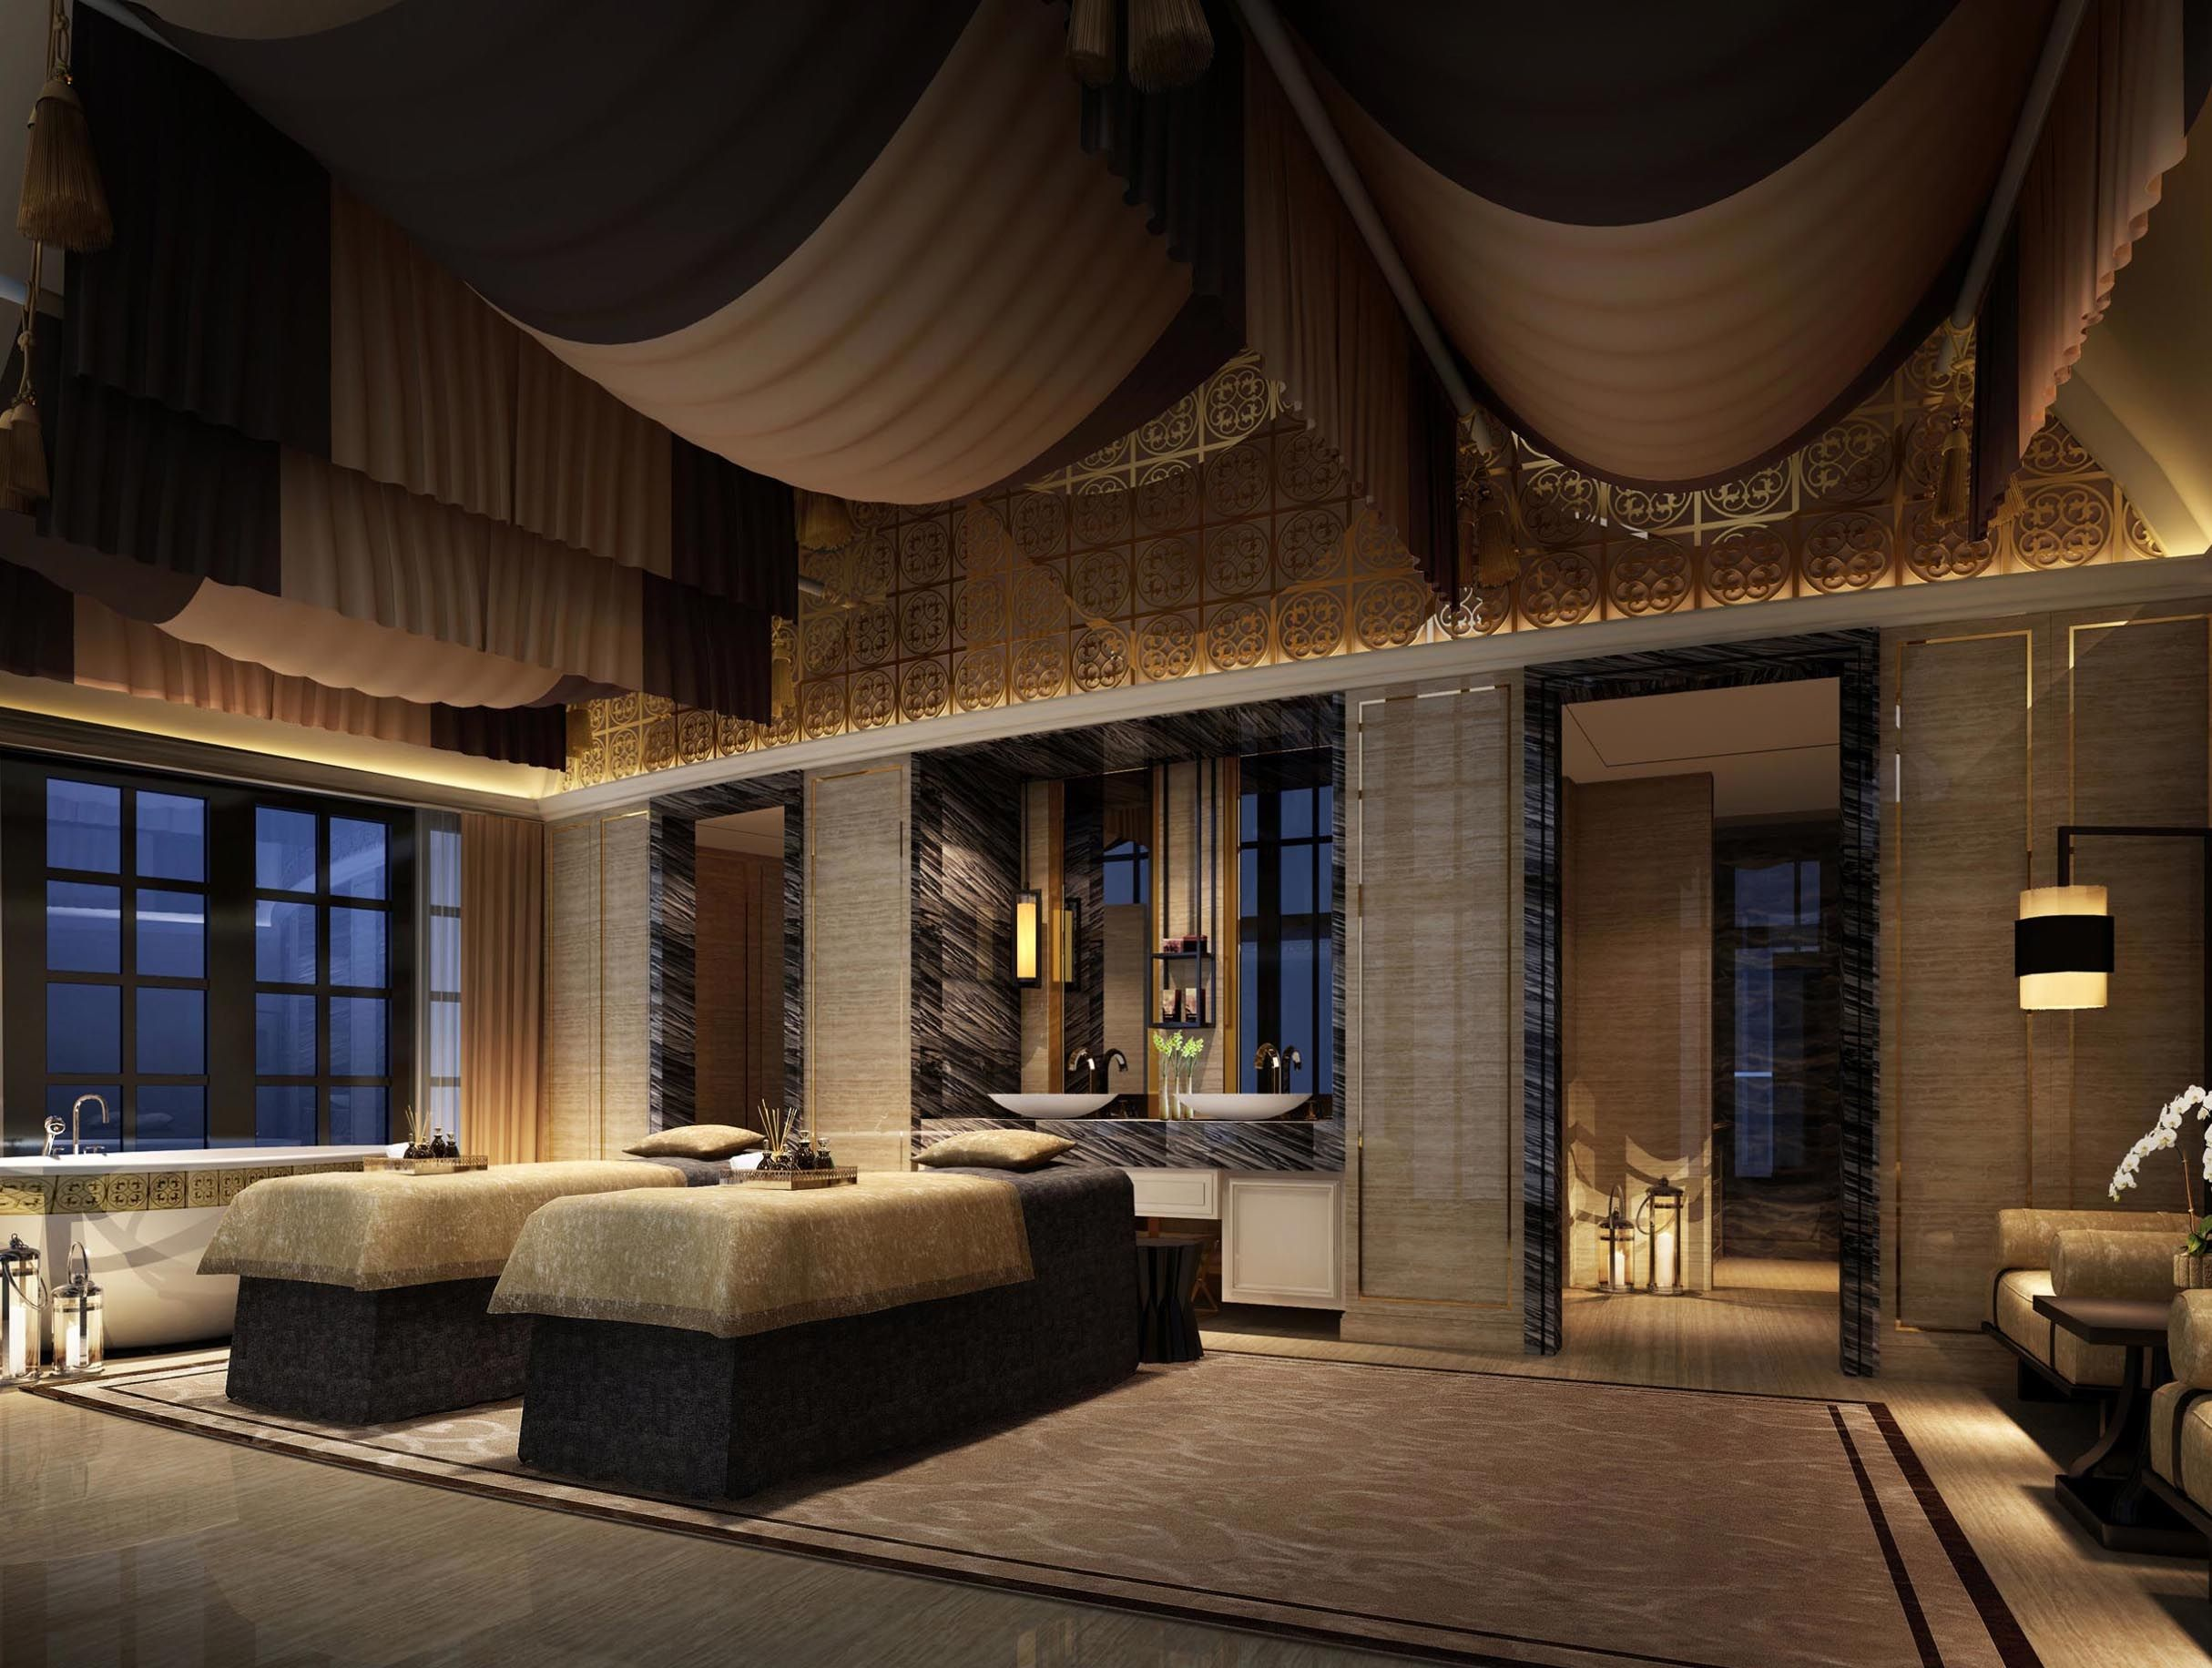 Merge Design Concept Merge Design Concept Spa Rooms Spa